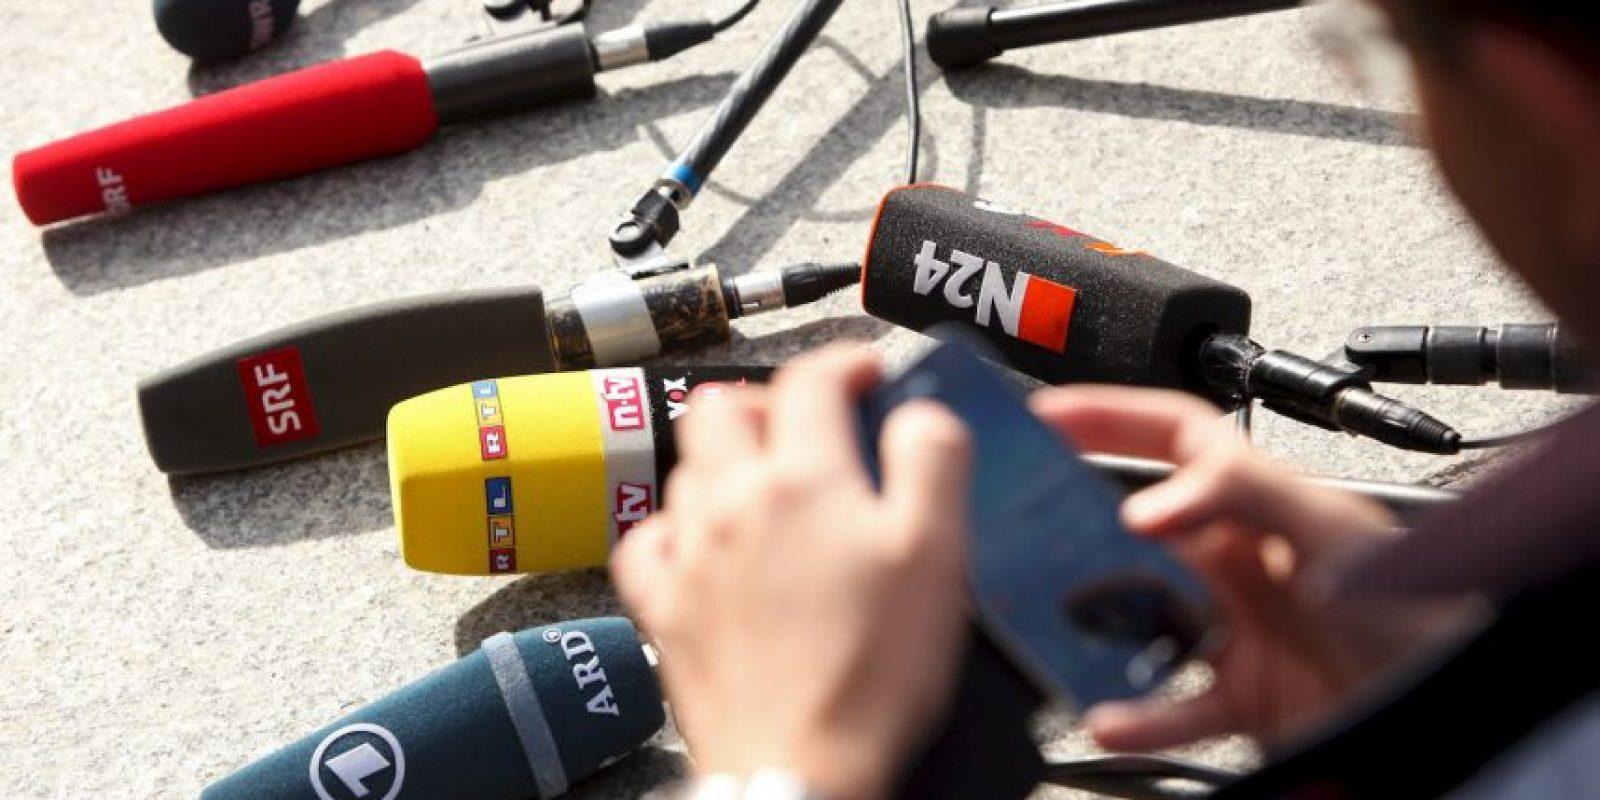 Un reportero intentó entrevistar a un cadáver. Foto:Getty Images